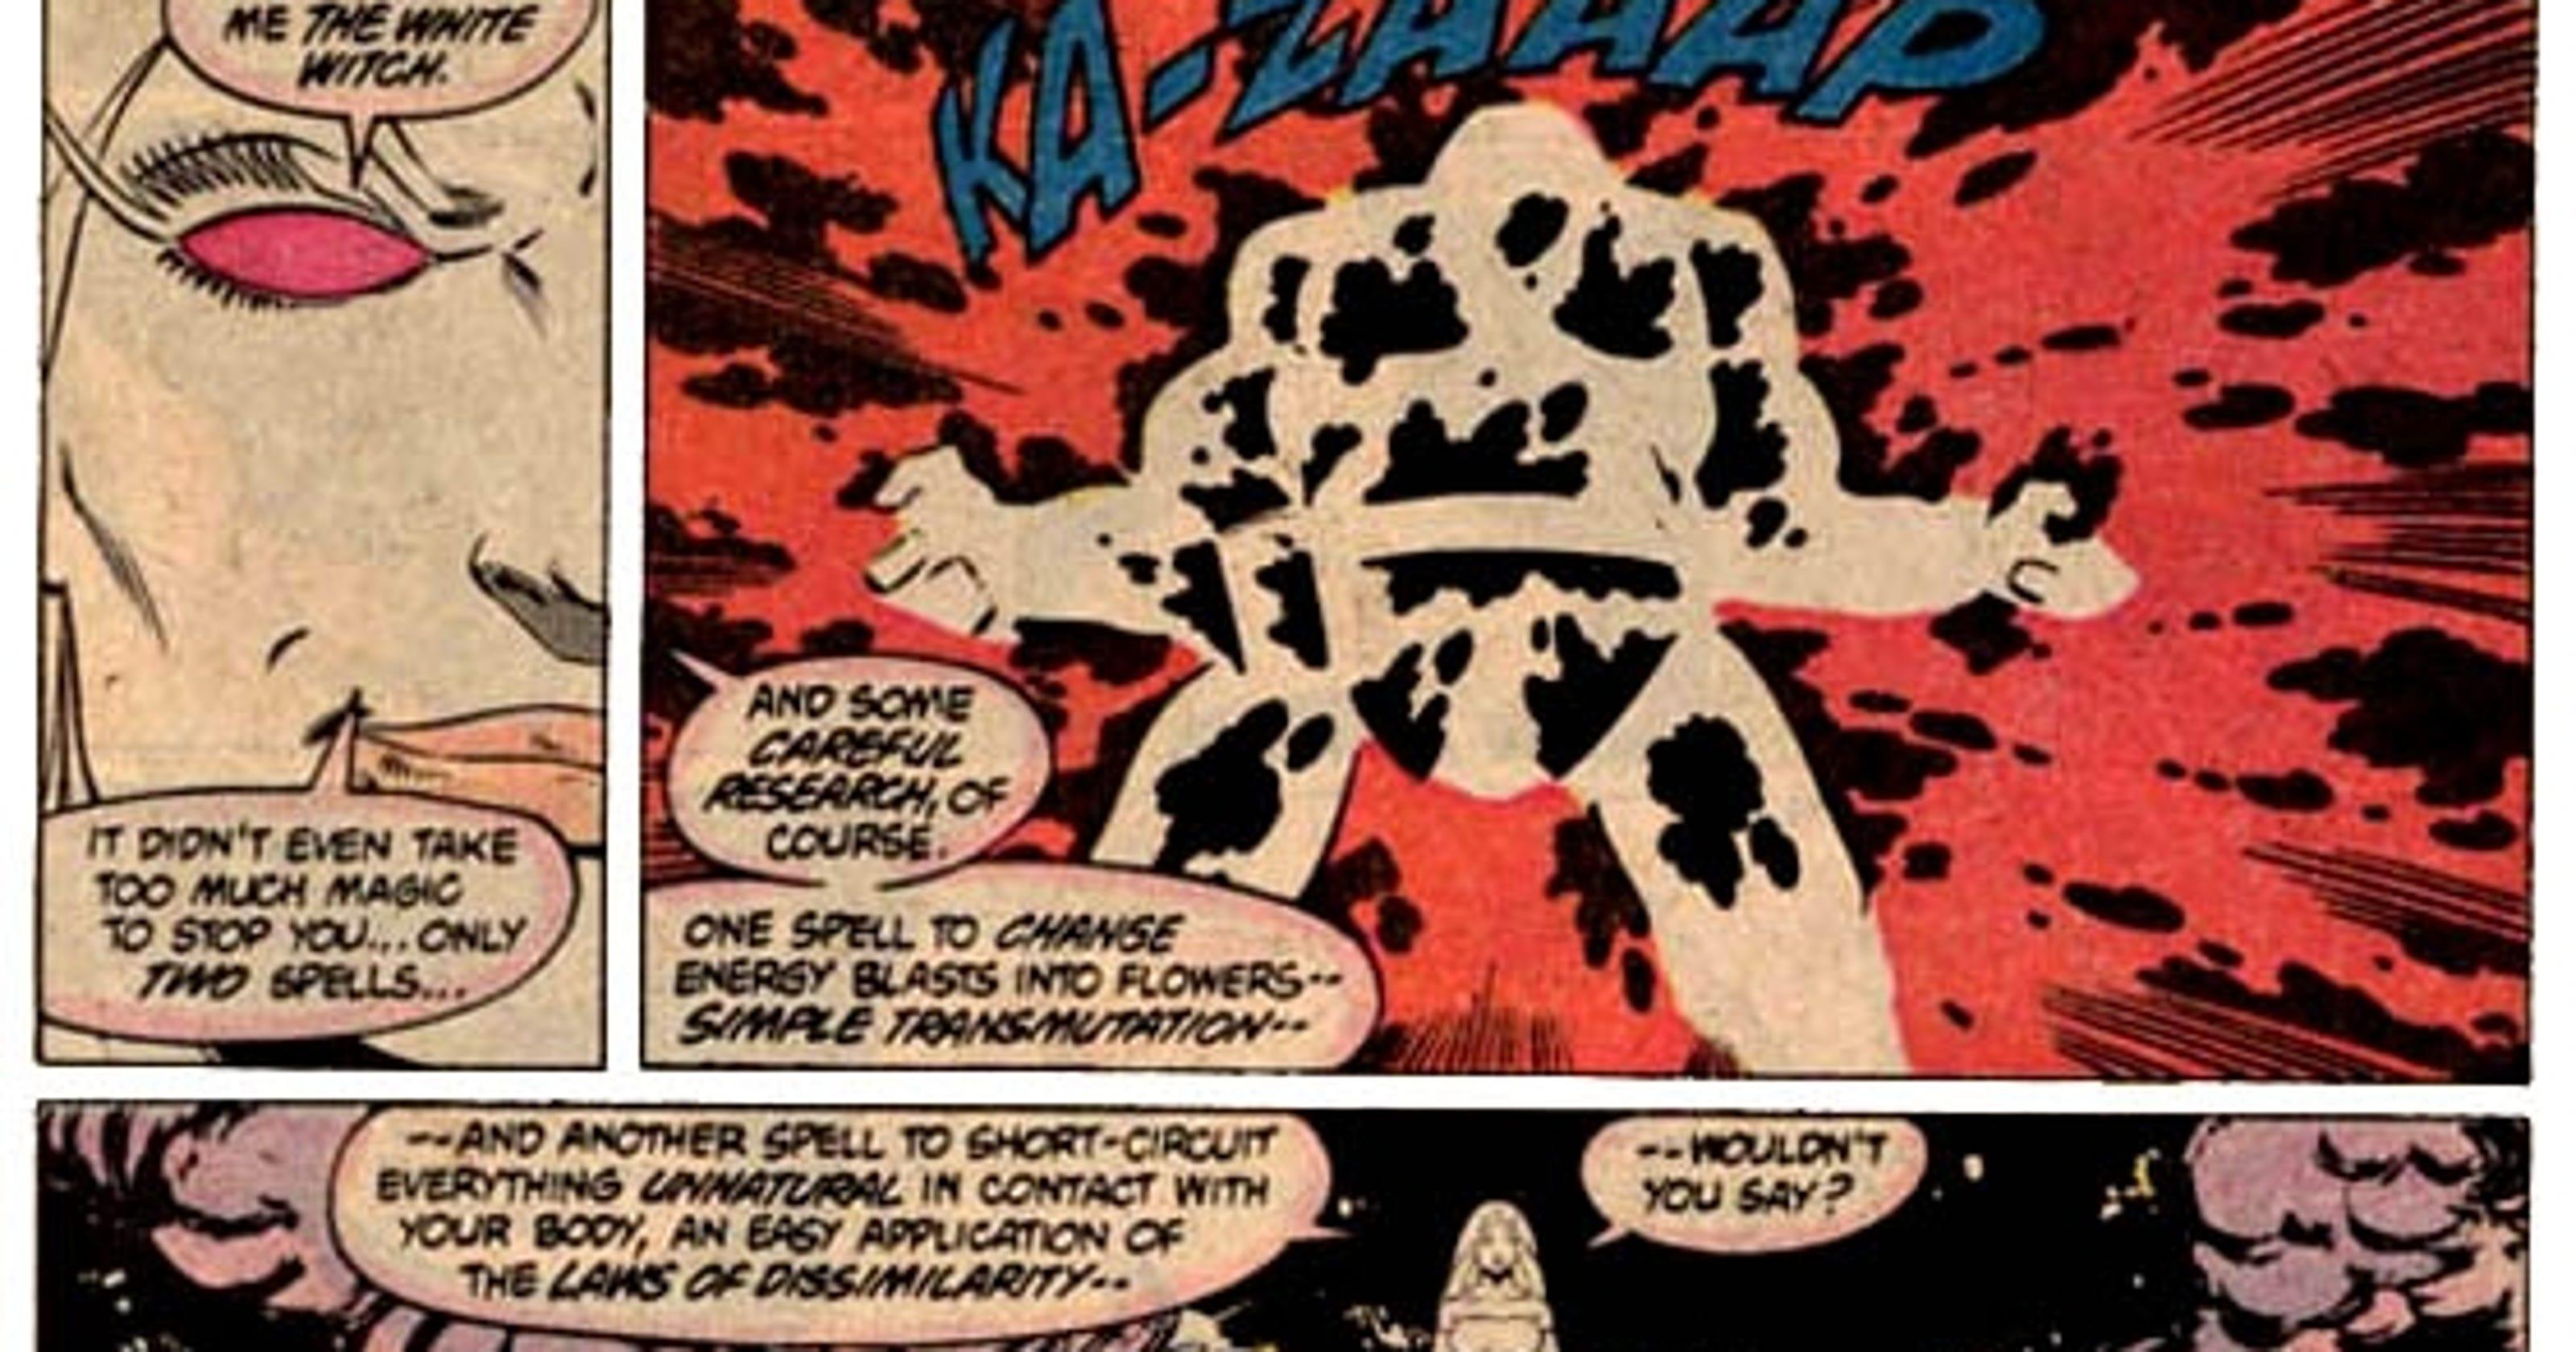 John Hodgman talks about Legion of Super-Heroes